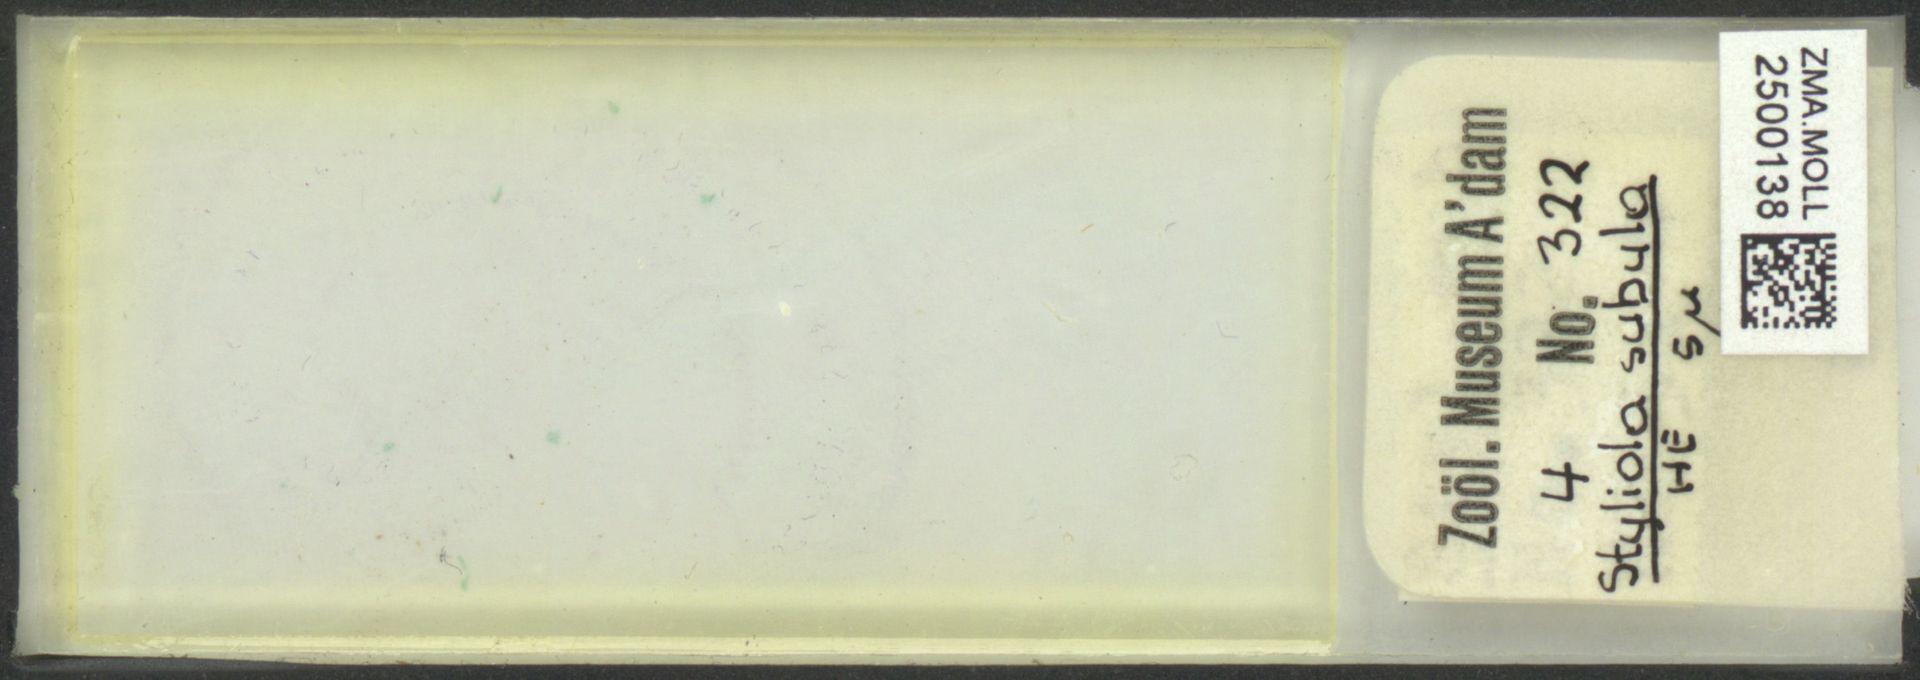 ZMA.MOLL.2500138 | Styliola subula (Quoy & Gaimard, 1827)